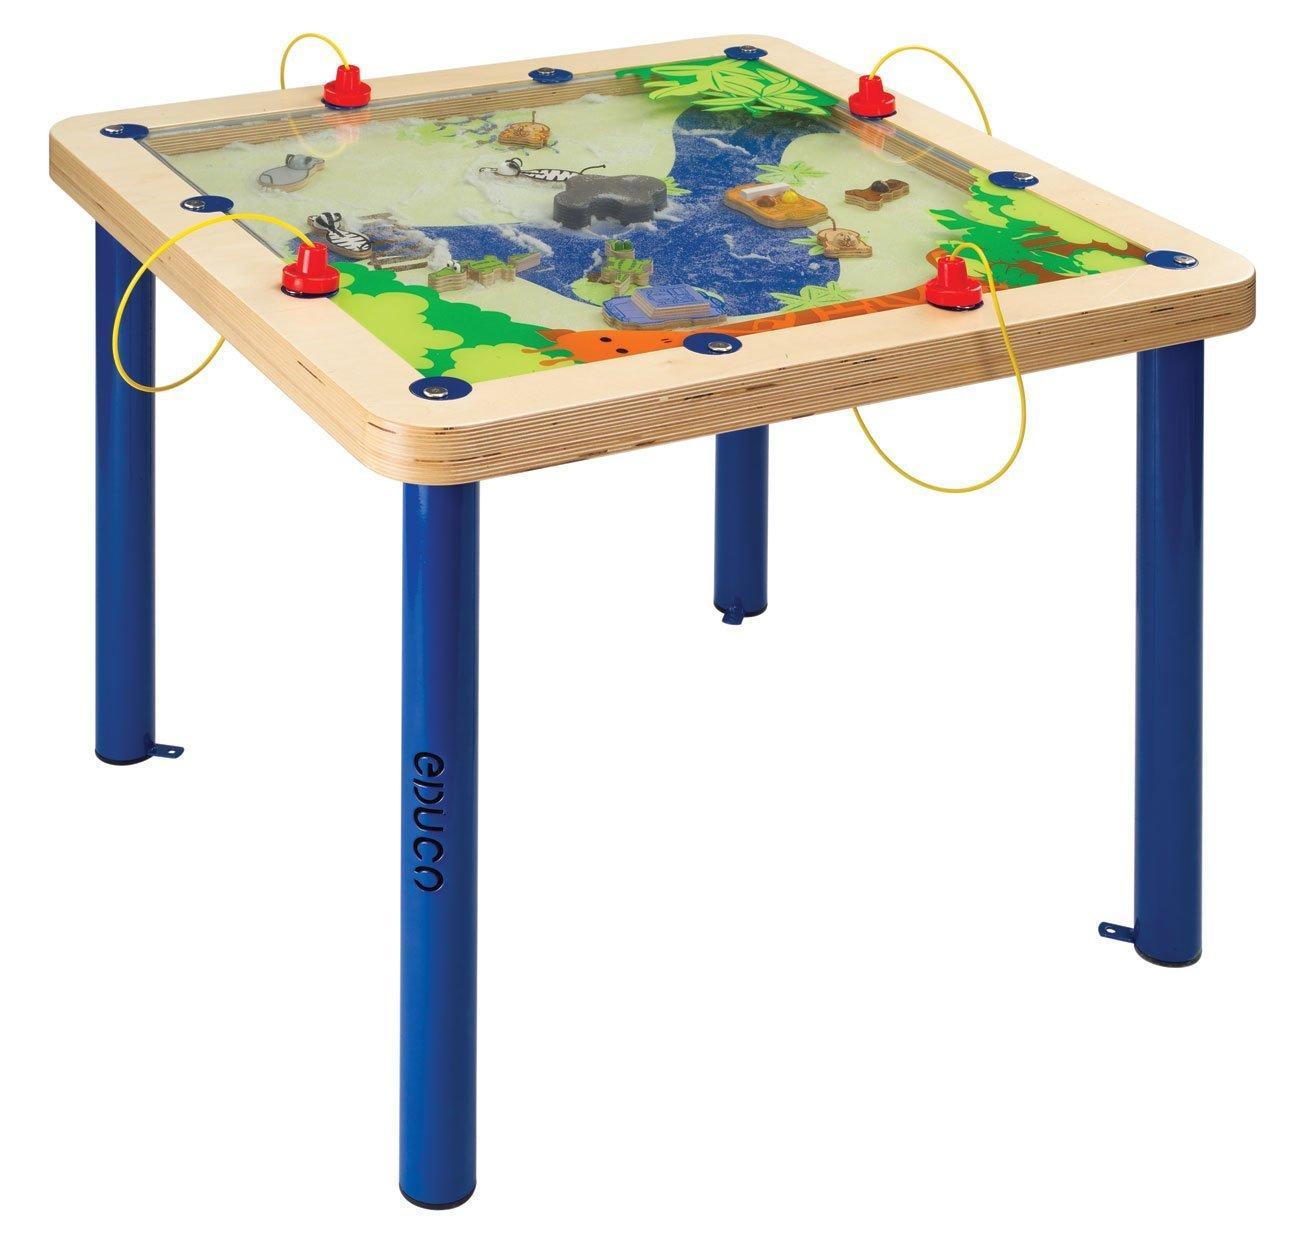 hape gofishgo magnetic wooden toddler maze puzzle maze puzzles  - view larger